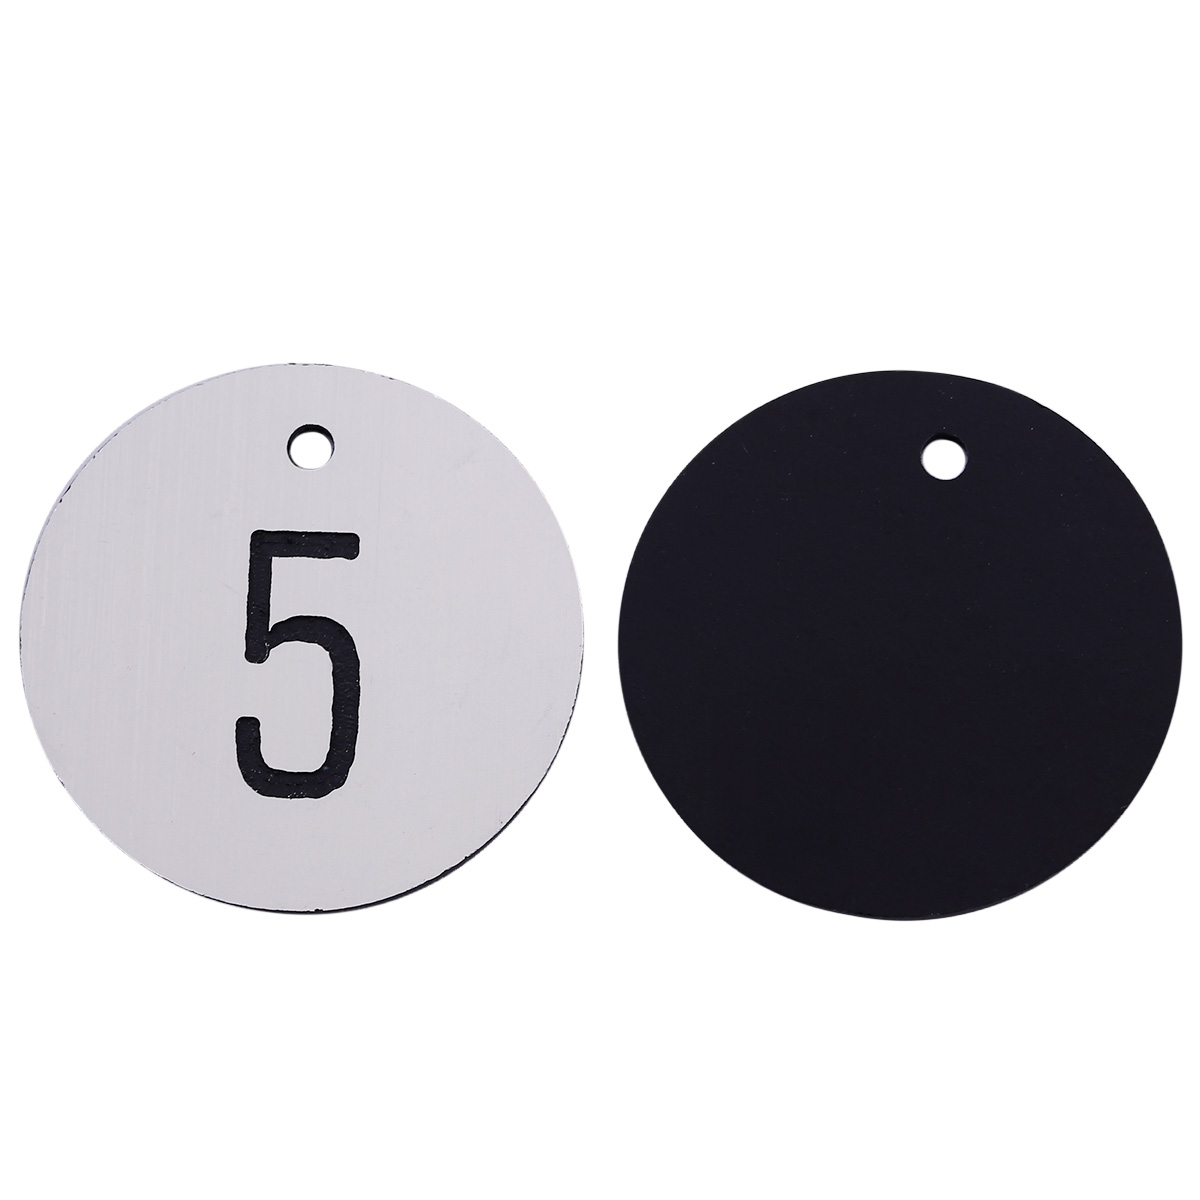 Engraved Aluminium Metal Faced Locker Numbers Discs Table Numbers Tags